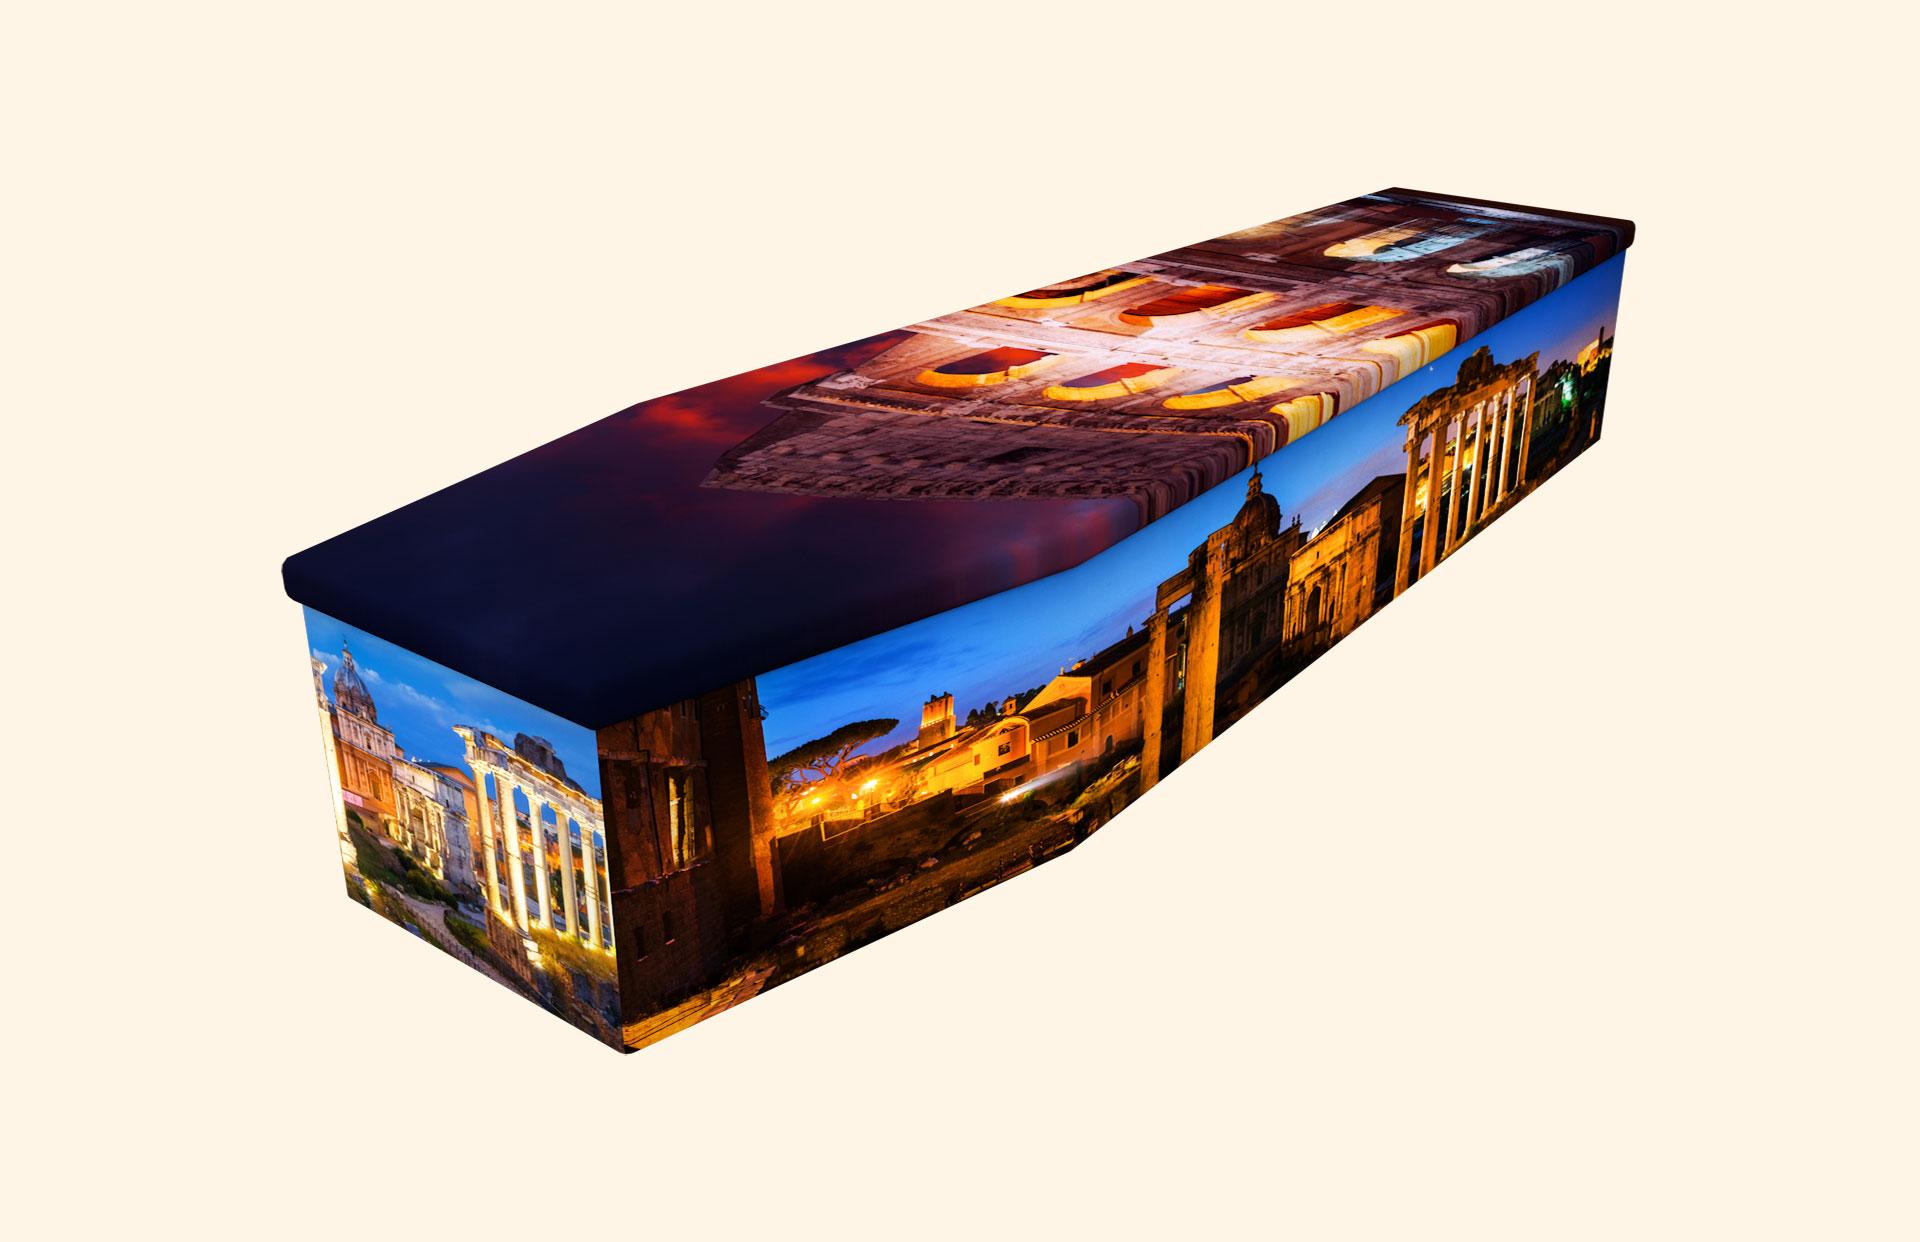 Roman Forum & Colosseum cardboard coffin